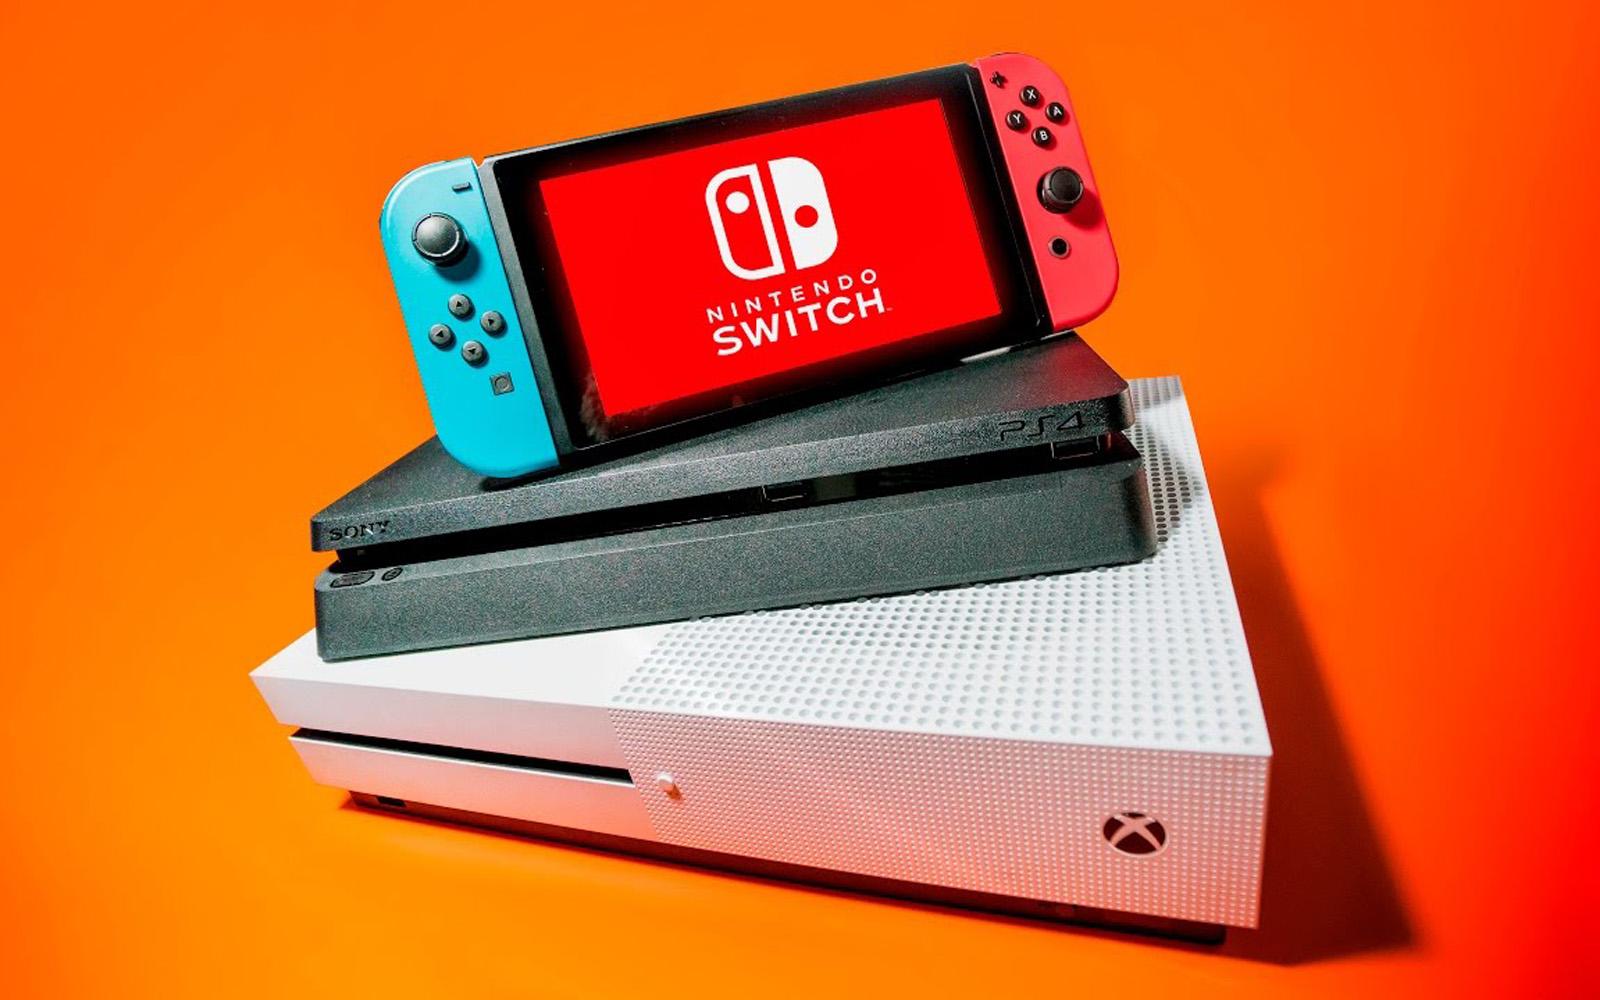 Black Friday 2017 3ds >> Walmart Black Friday 2017 Deals - PS4, Xbox, Nintendo Switch, Wii U, 3DS, Games